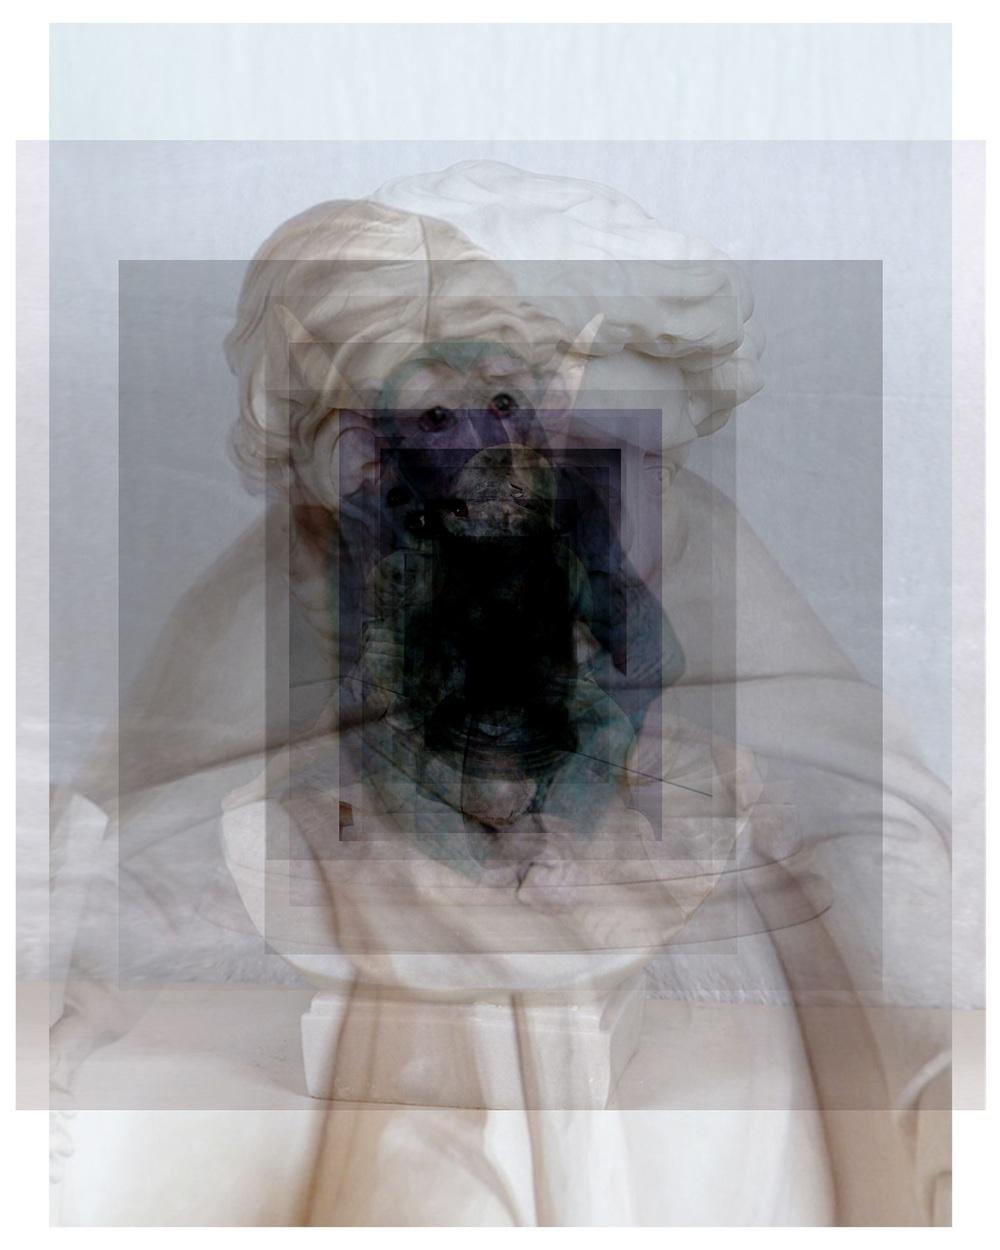 Alessandro Calabrese,20140212 Michelangelo,dalla serie A Failed Entertainment, Stampa inkjet su carta Pearl, cm 100x80 © Alessandro Calabrese, courtesy Viasaterna